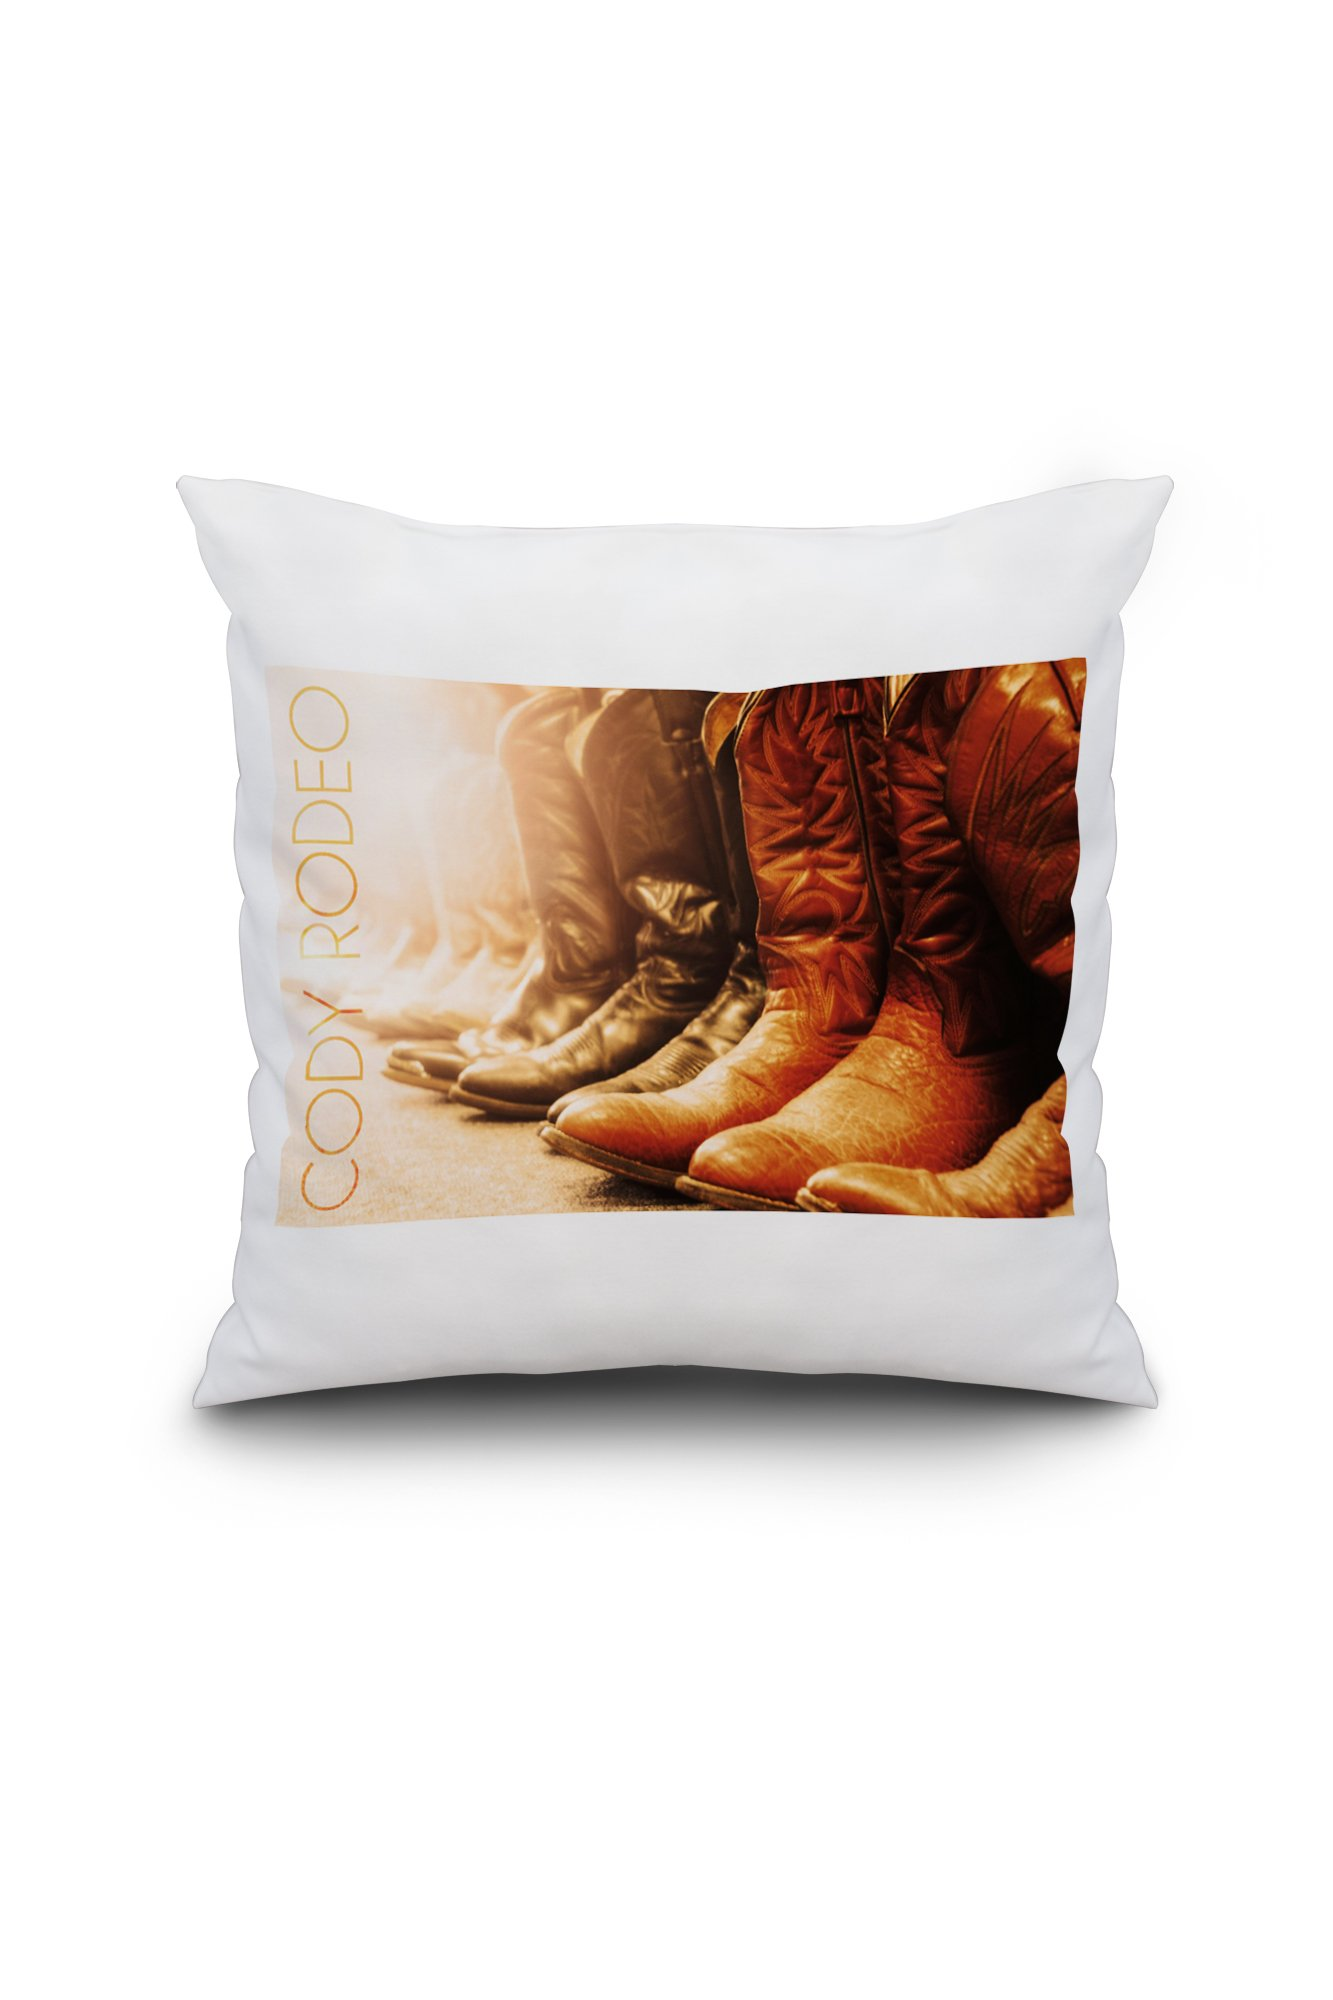 Wyoming - Codeo Rodeo - Cowboy Boots (18x18 Spun Polyester Pillow, Custom Border)